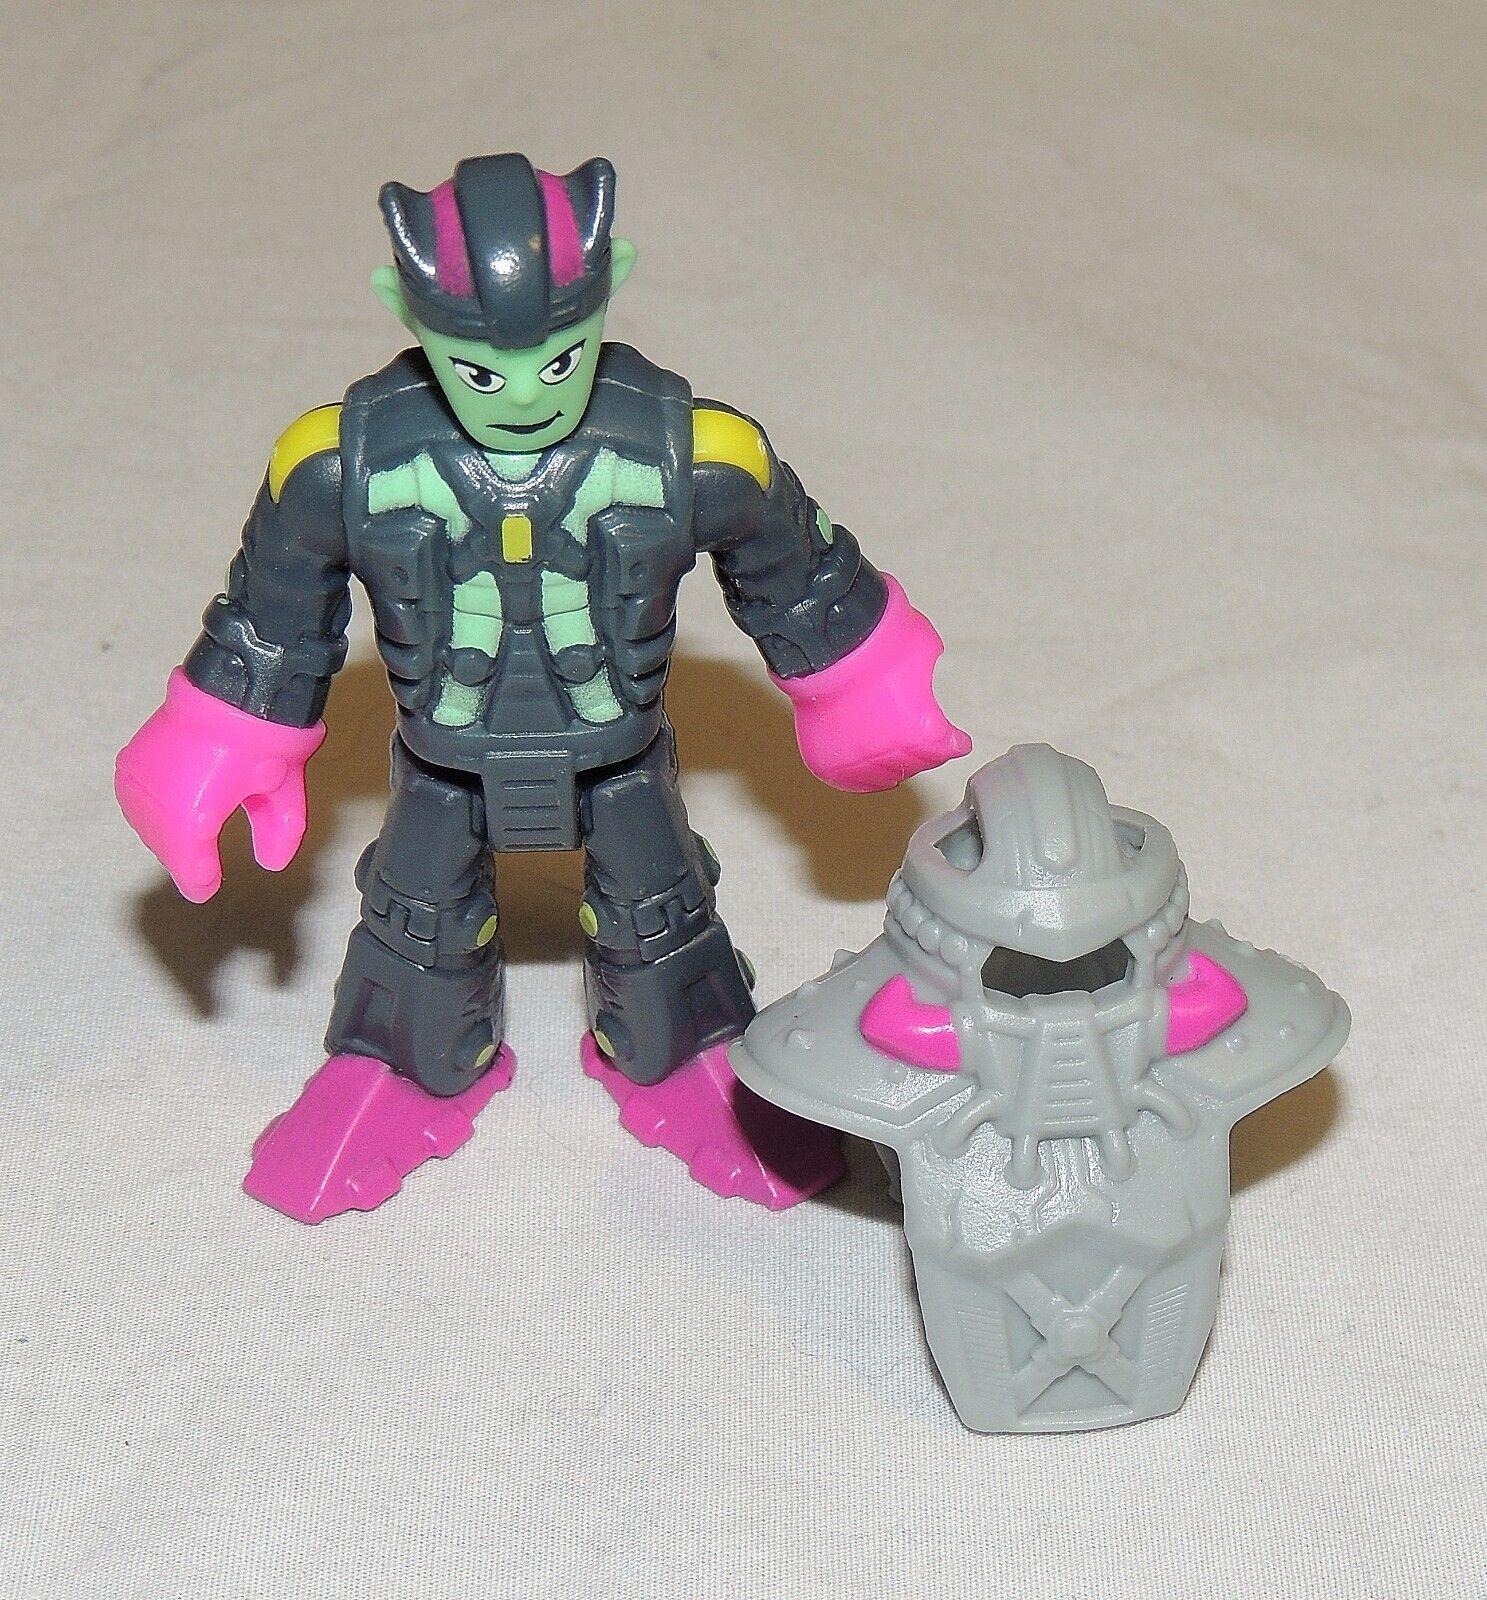 New Imaginext Blind Bag Series 7 Alien Half Robot Space Martian Green